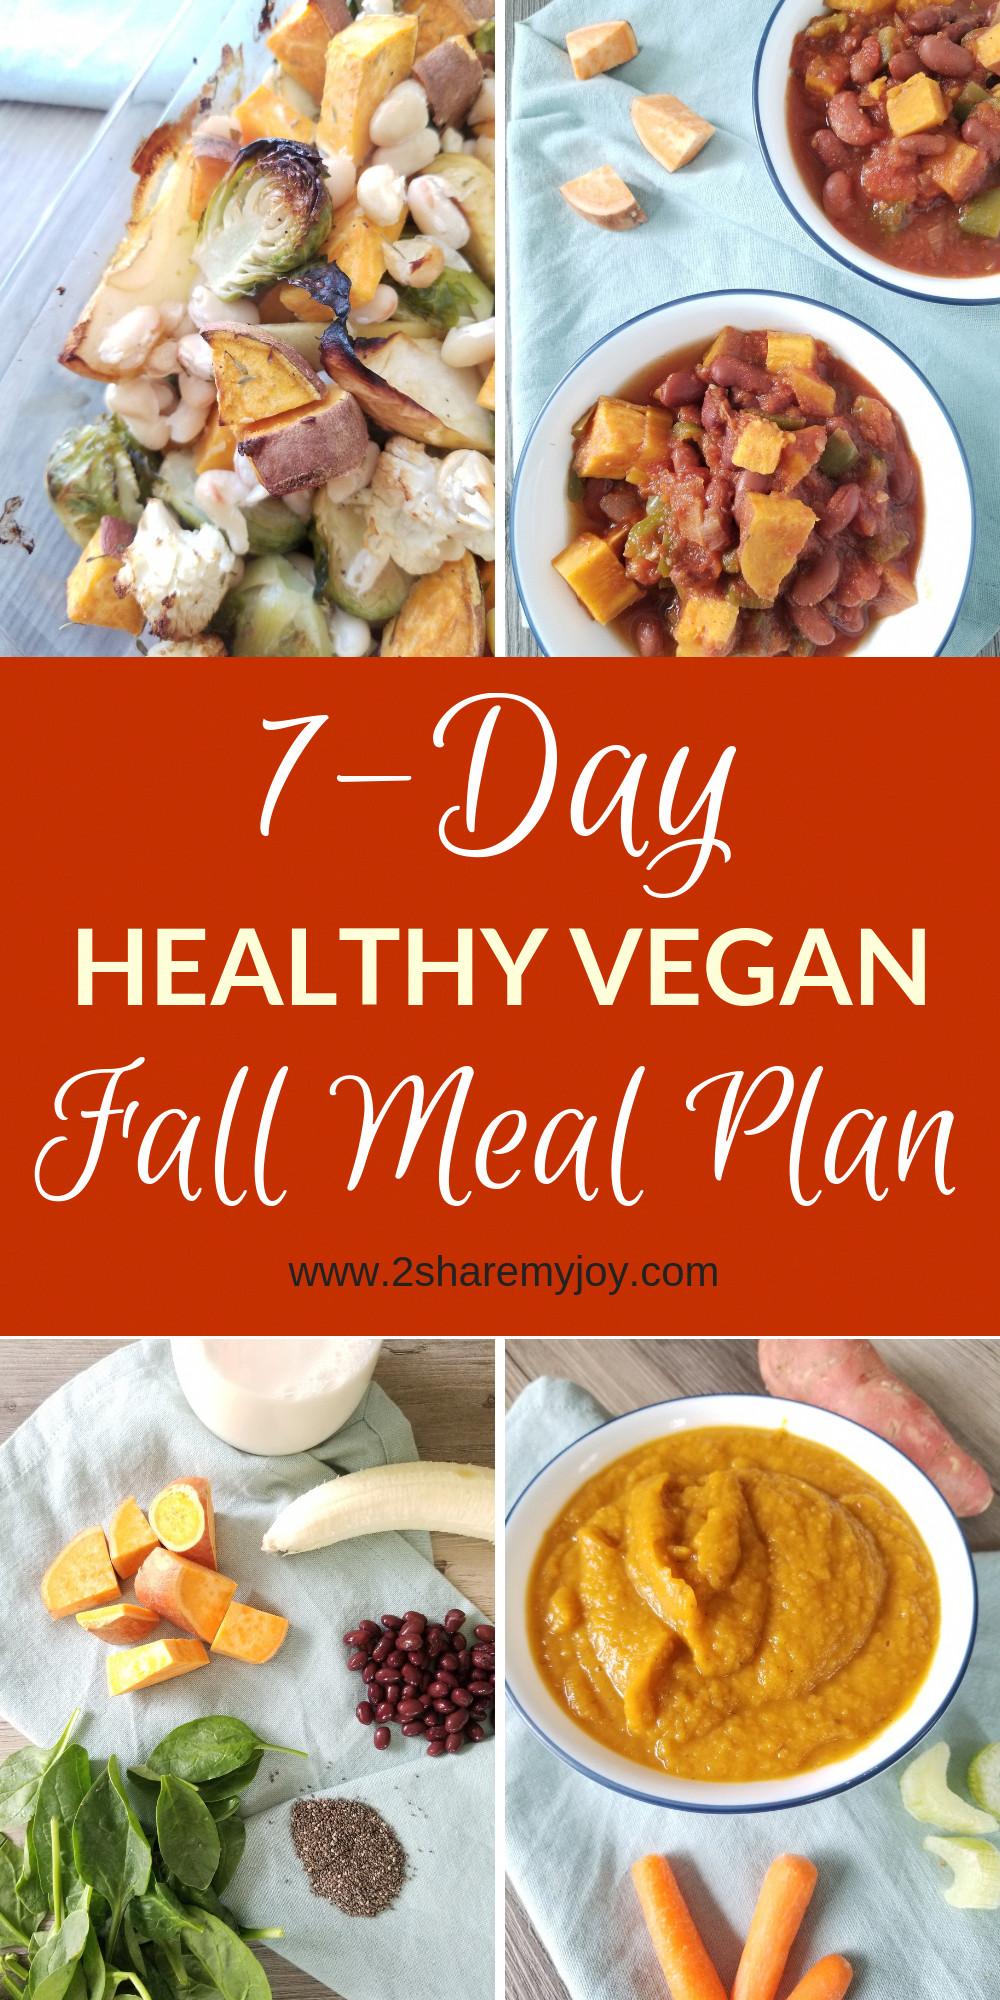 Vegan Diet Plan For Beginners  7 day healthy vegan fall meal plan great easy vegan meal